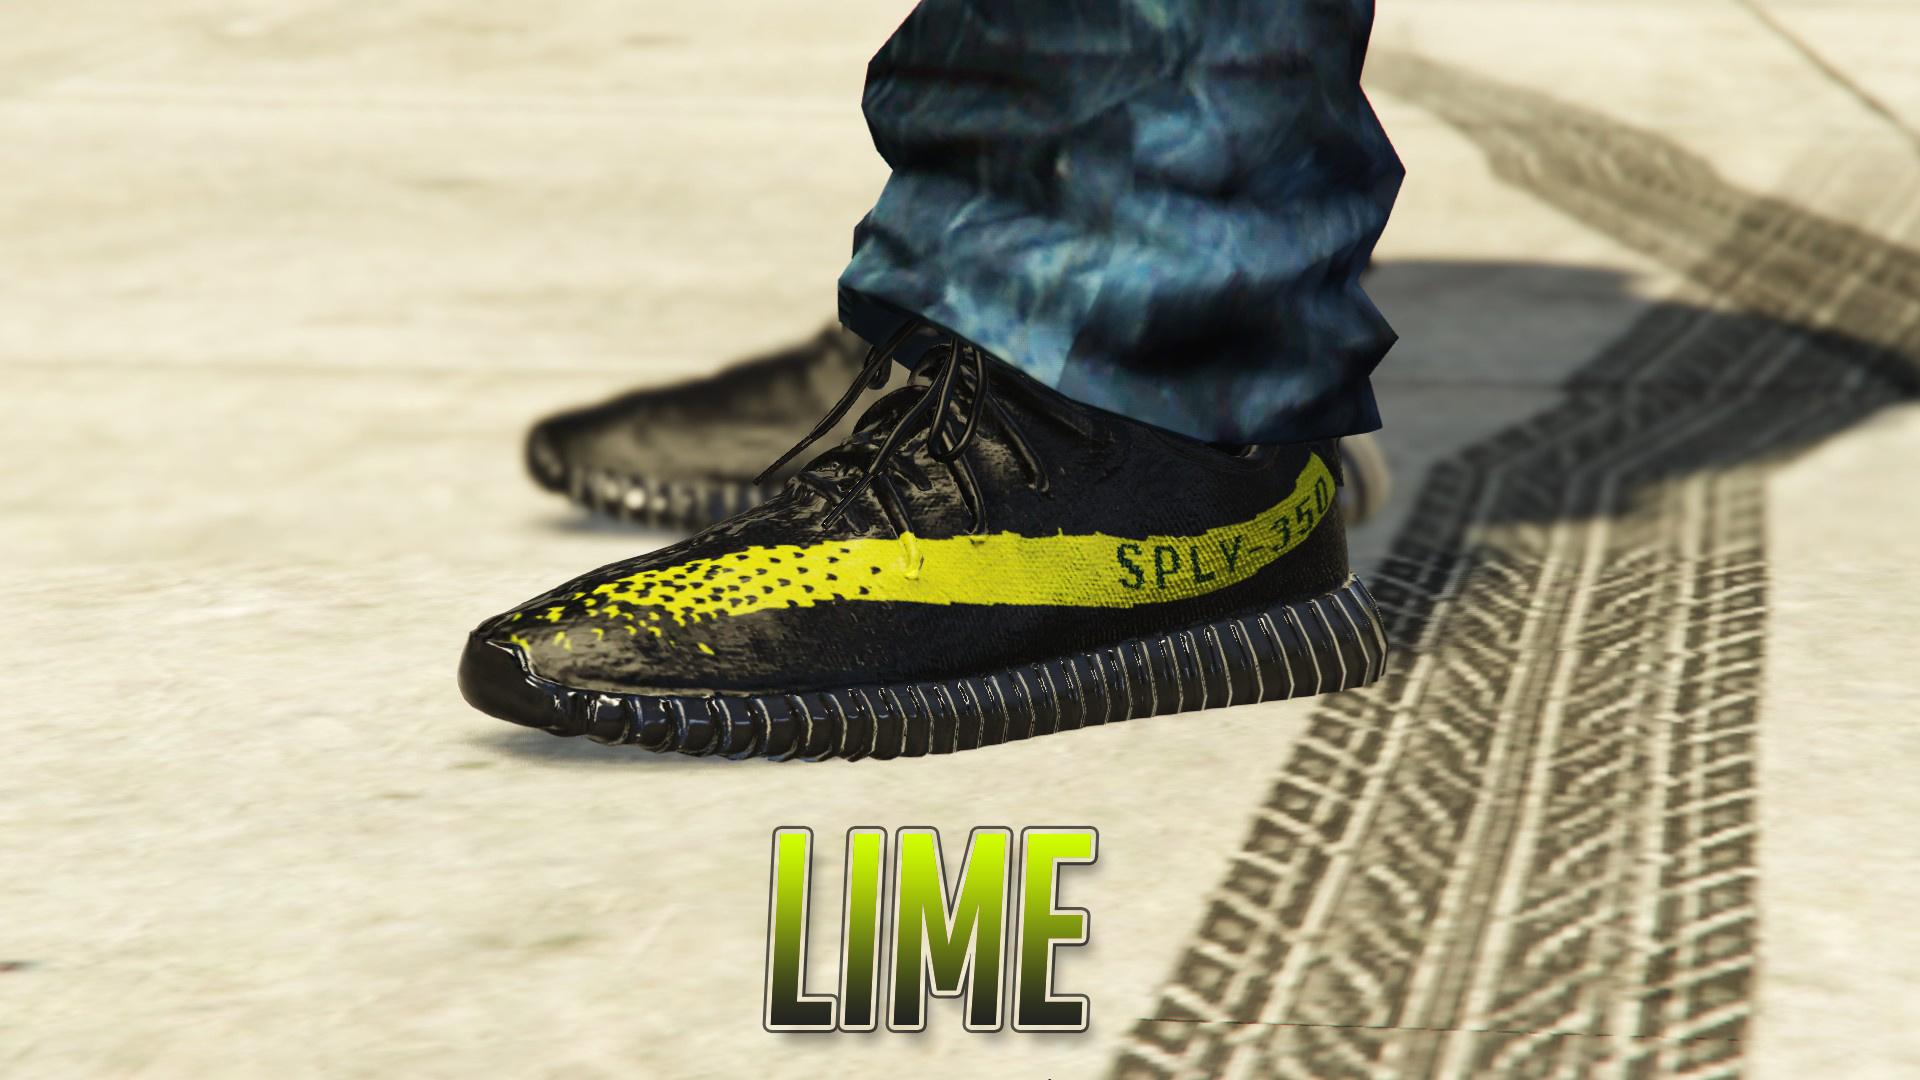 Adidas Yeezy Boost 350 V2 BY1604 Pre Release Megathread 12/17/16